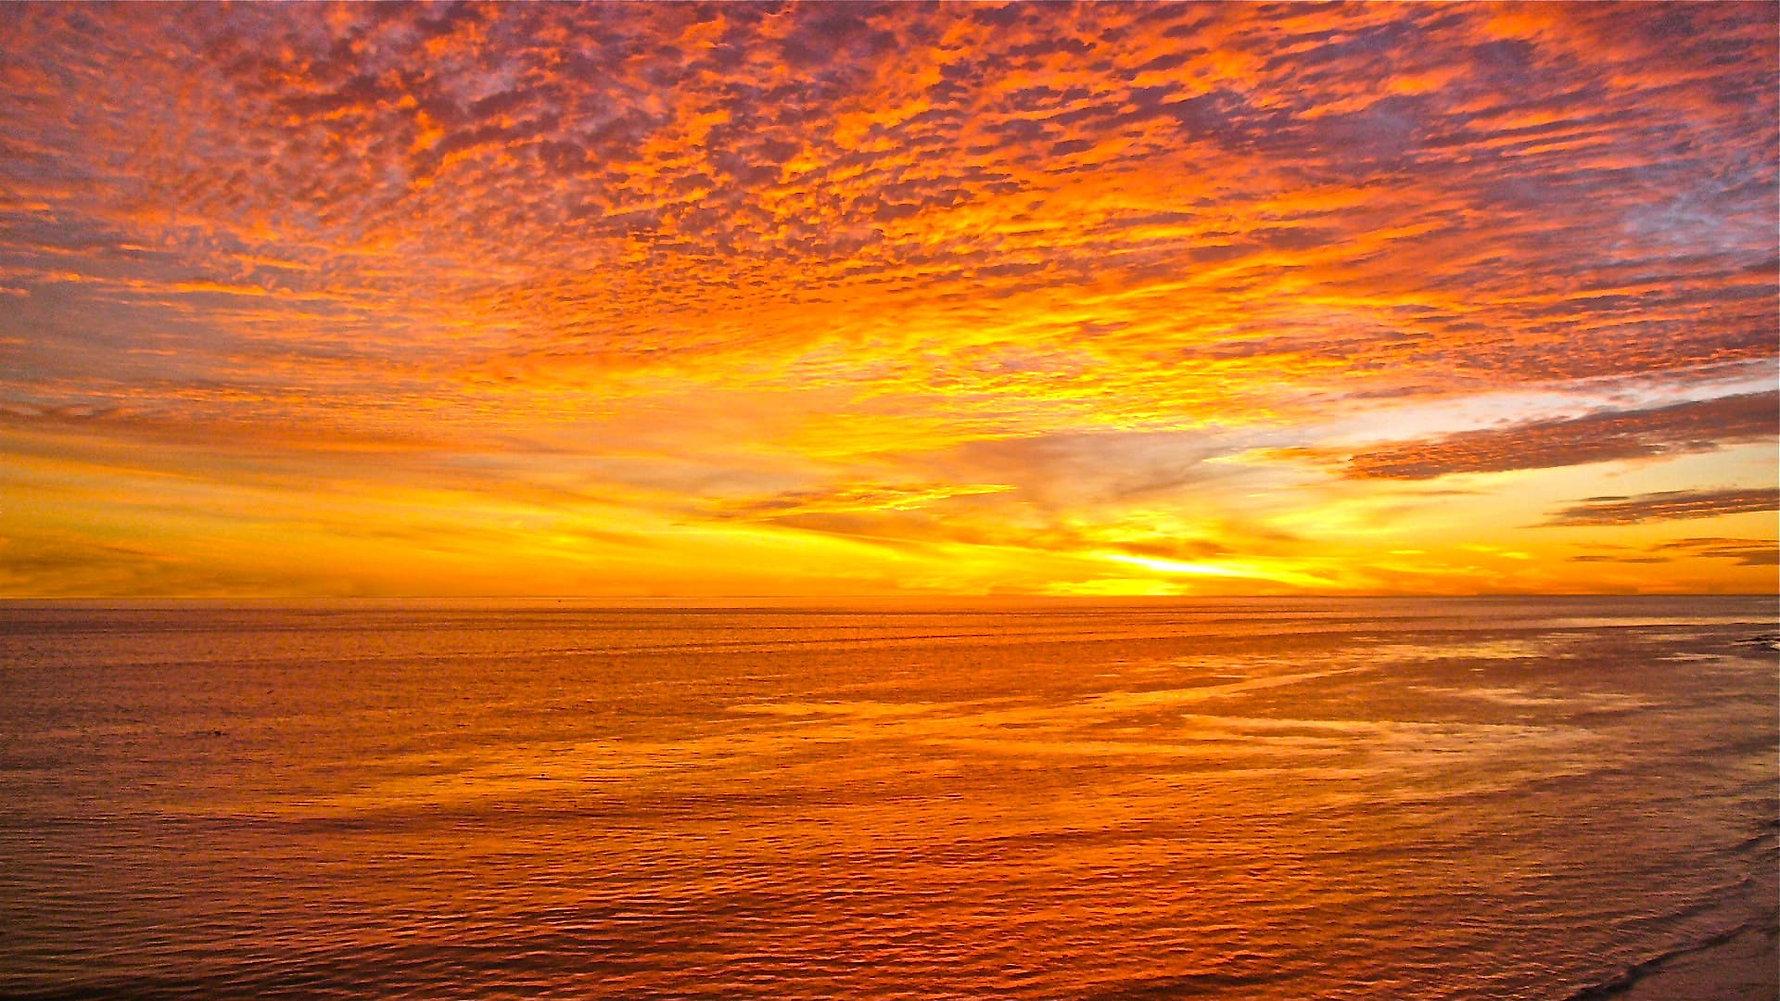 atlantic-ocean-sunset-refv36_edited.jpg